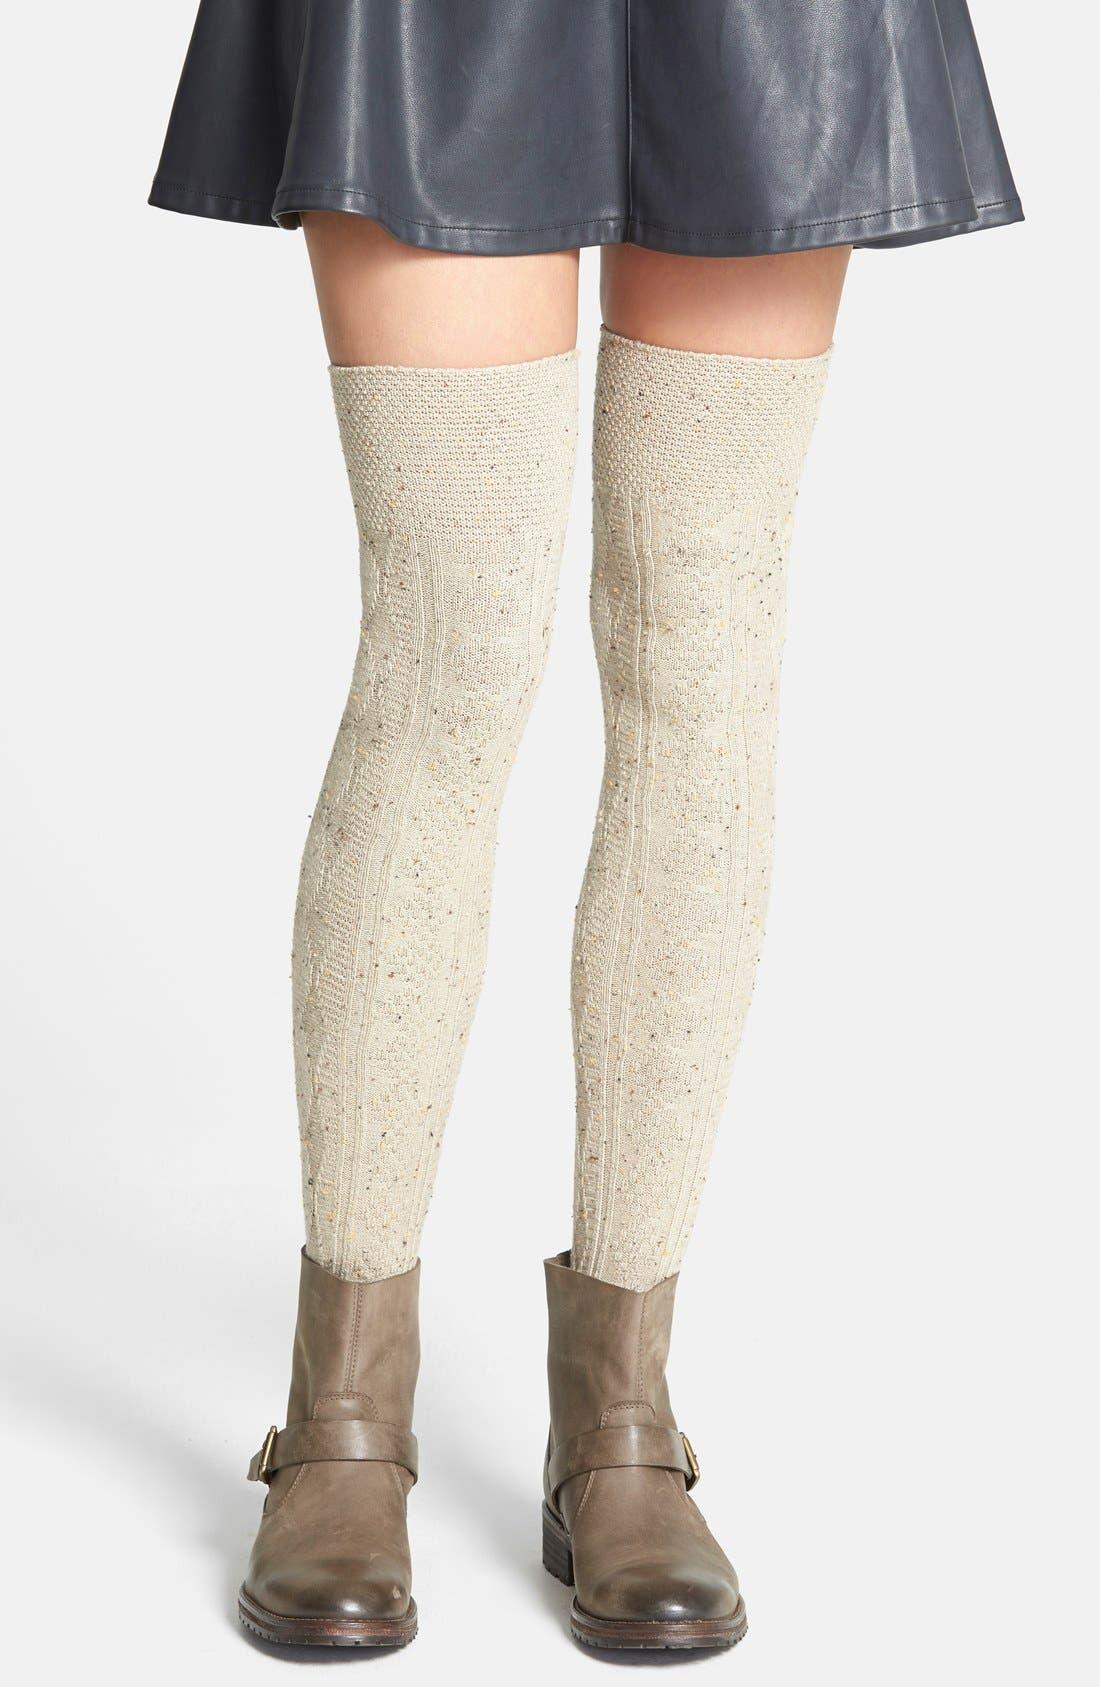 Alternate Image 1 Selected - Nordstrom 'Confetti' Over The Knee Socks